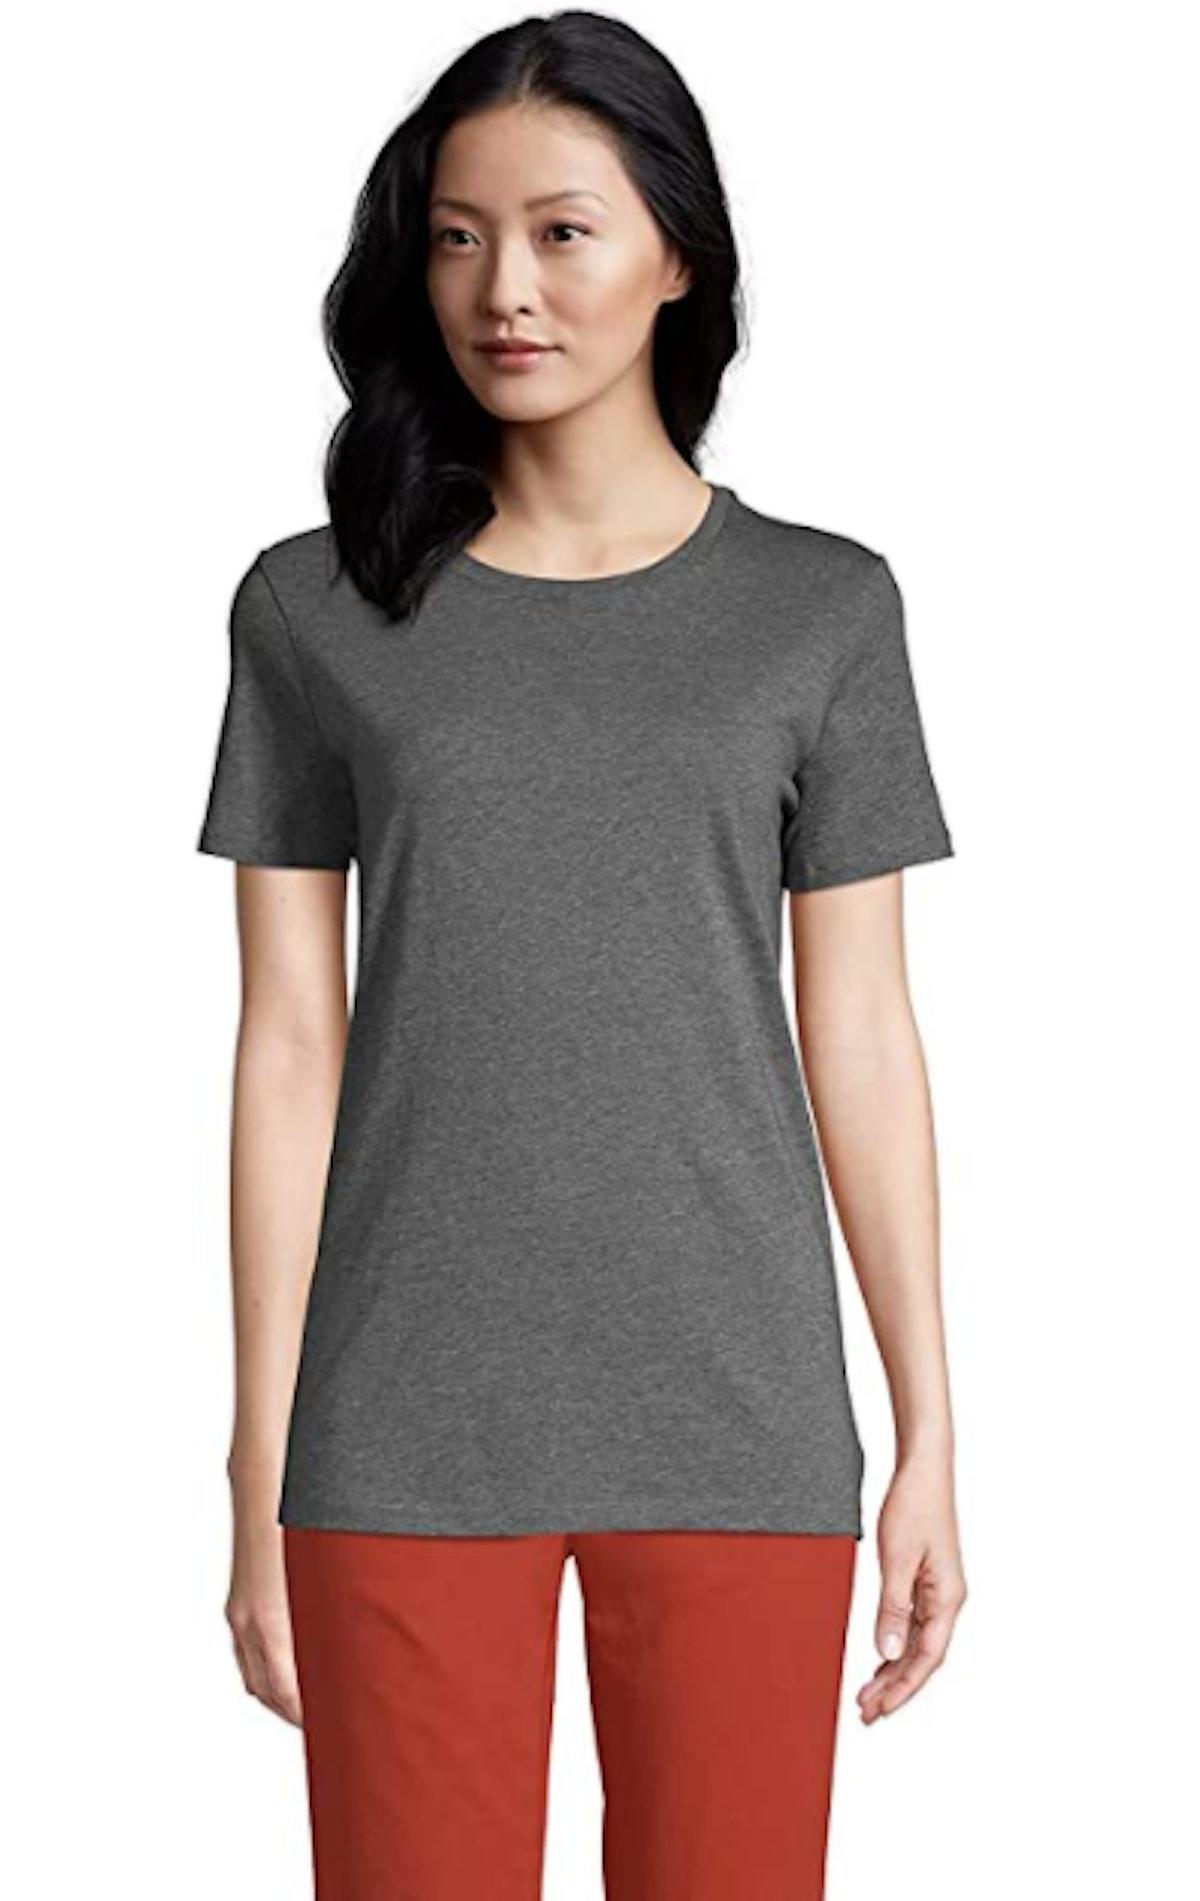 Lands' End Supima Cotton Short Sleeve Crewneck T-Shirt